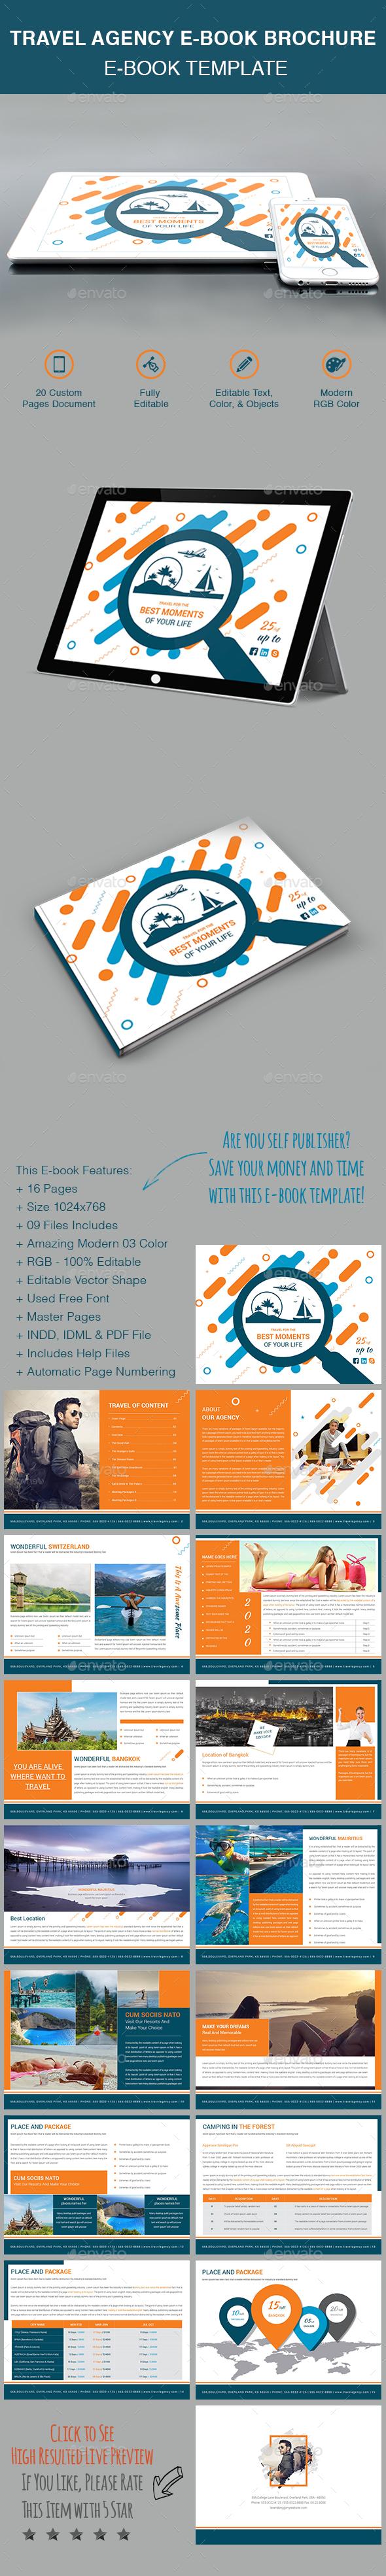 Travel Agency E-Book Brochure - Digital Books ePublishing